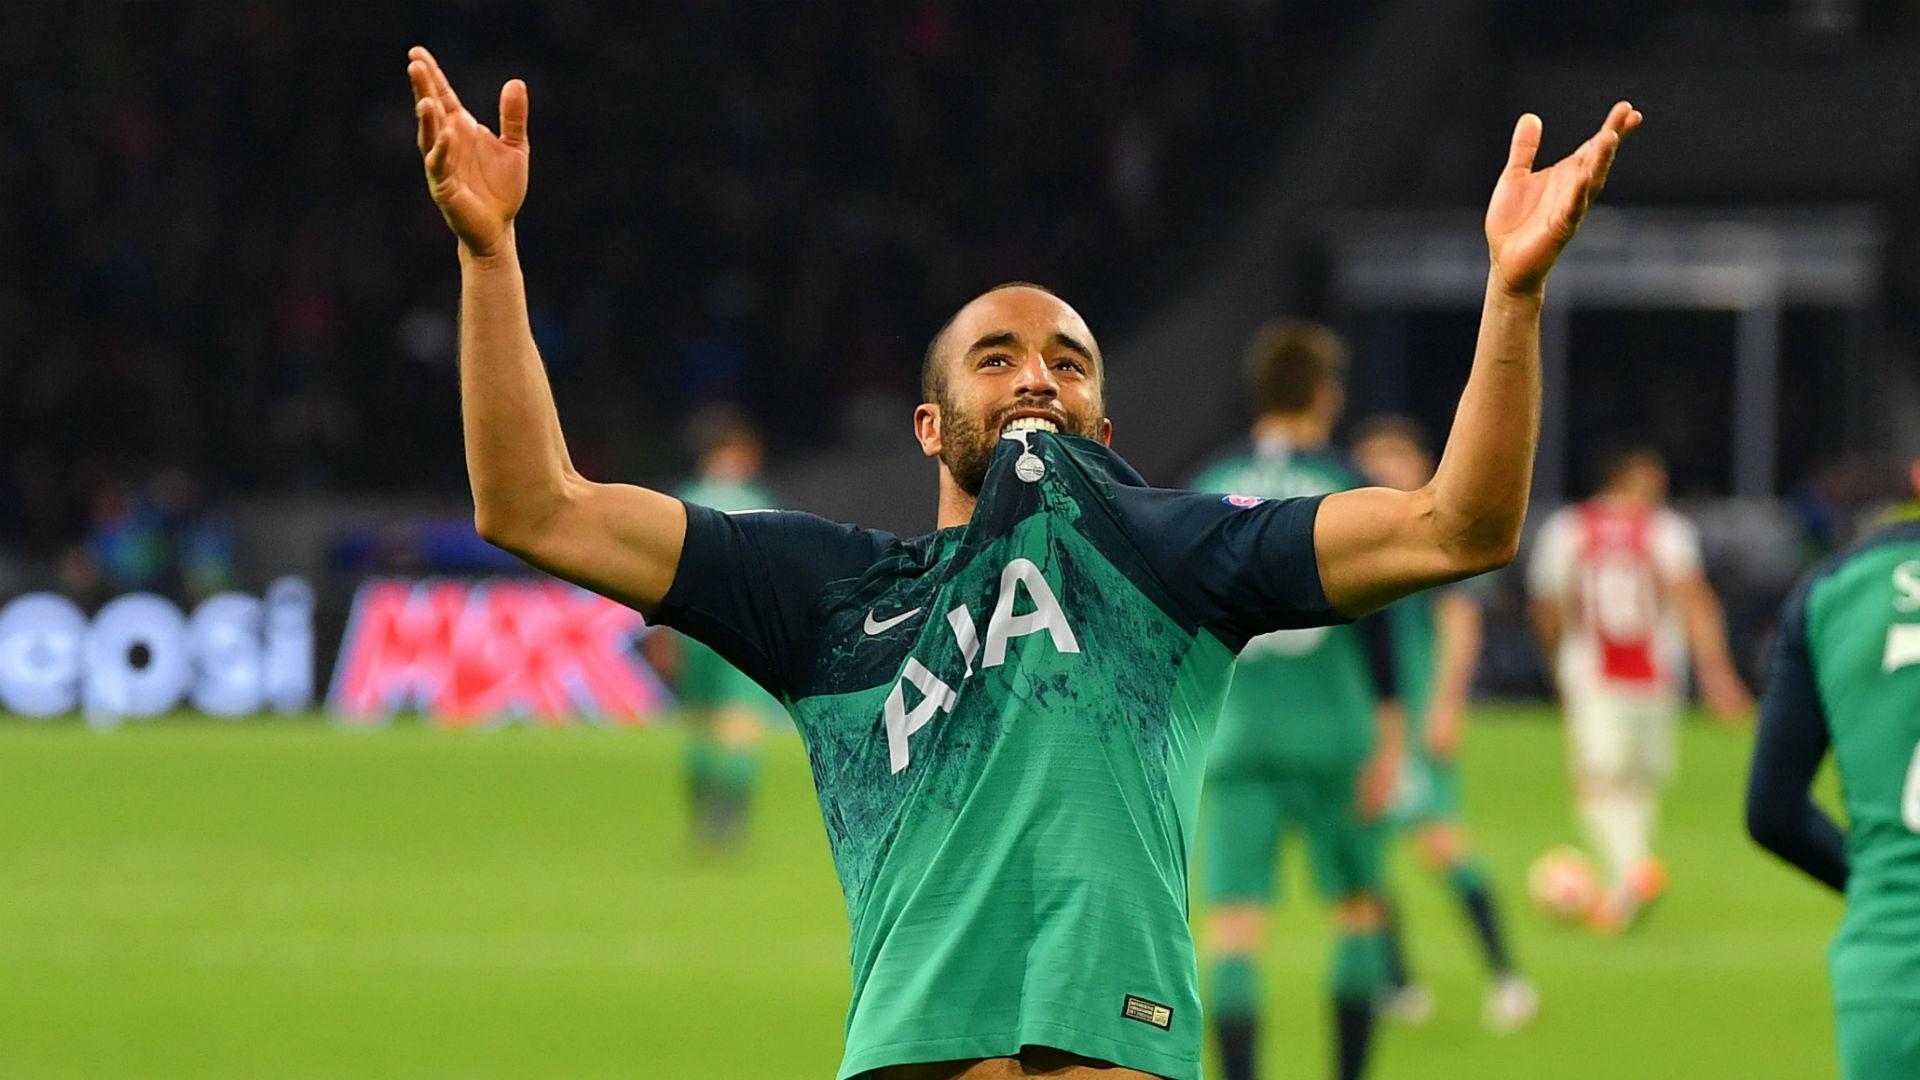 'I hope he gets a statue': Christian Eriksen heaps praise on Tottenham hero Lucas Moura